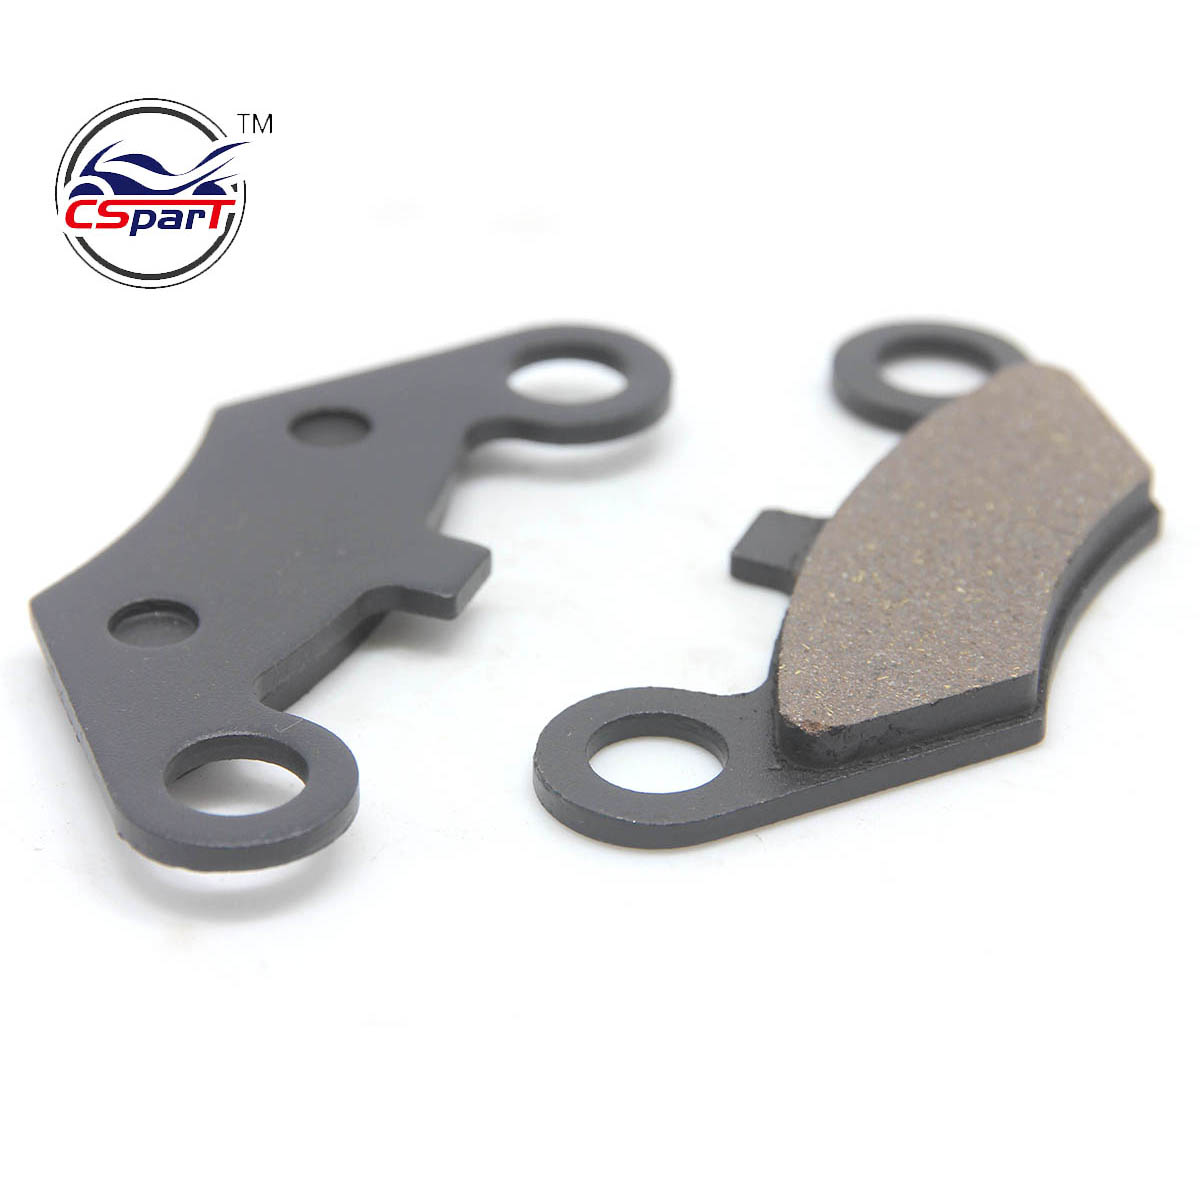 1 SET 2PCS Front Brake Pad For CF Moto CFMoto CF500 500 500CC CF600 600 600CC X5 X6 X8 U5 ATV UTV Shineary